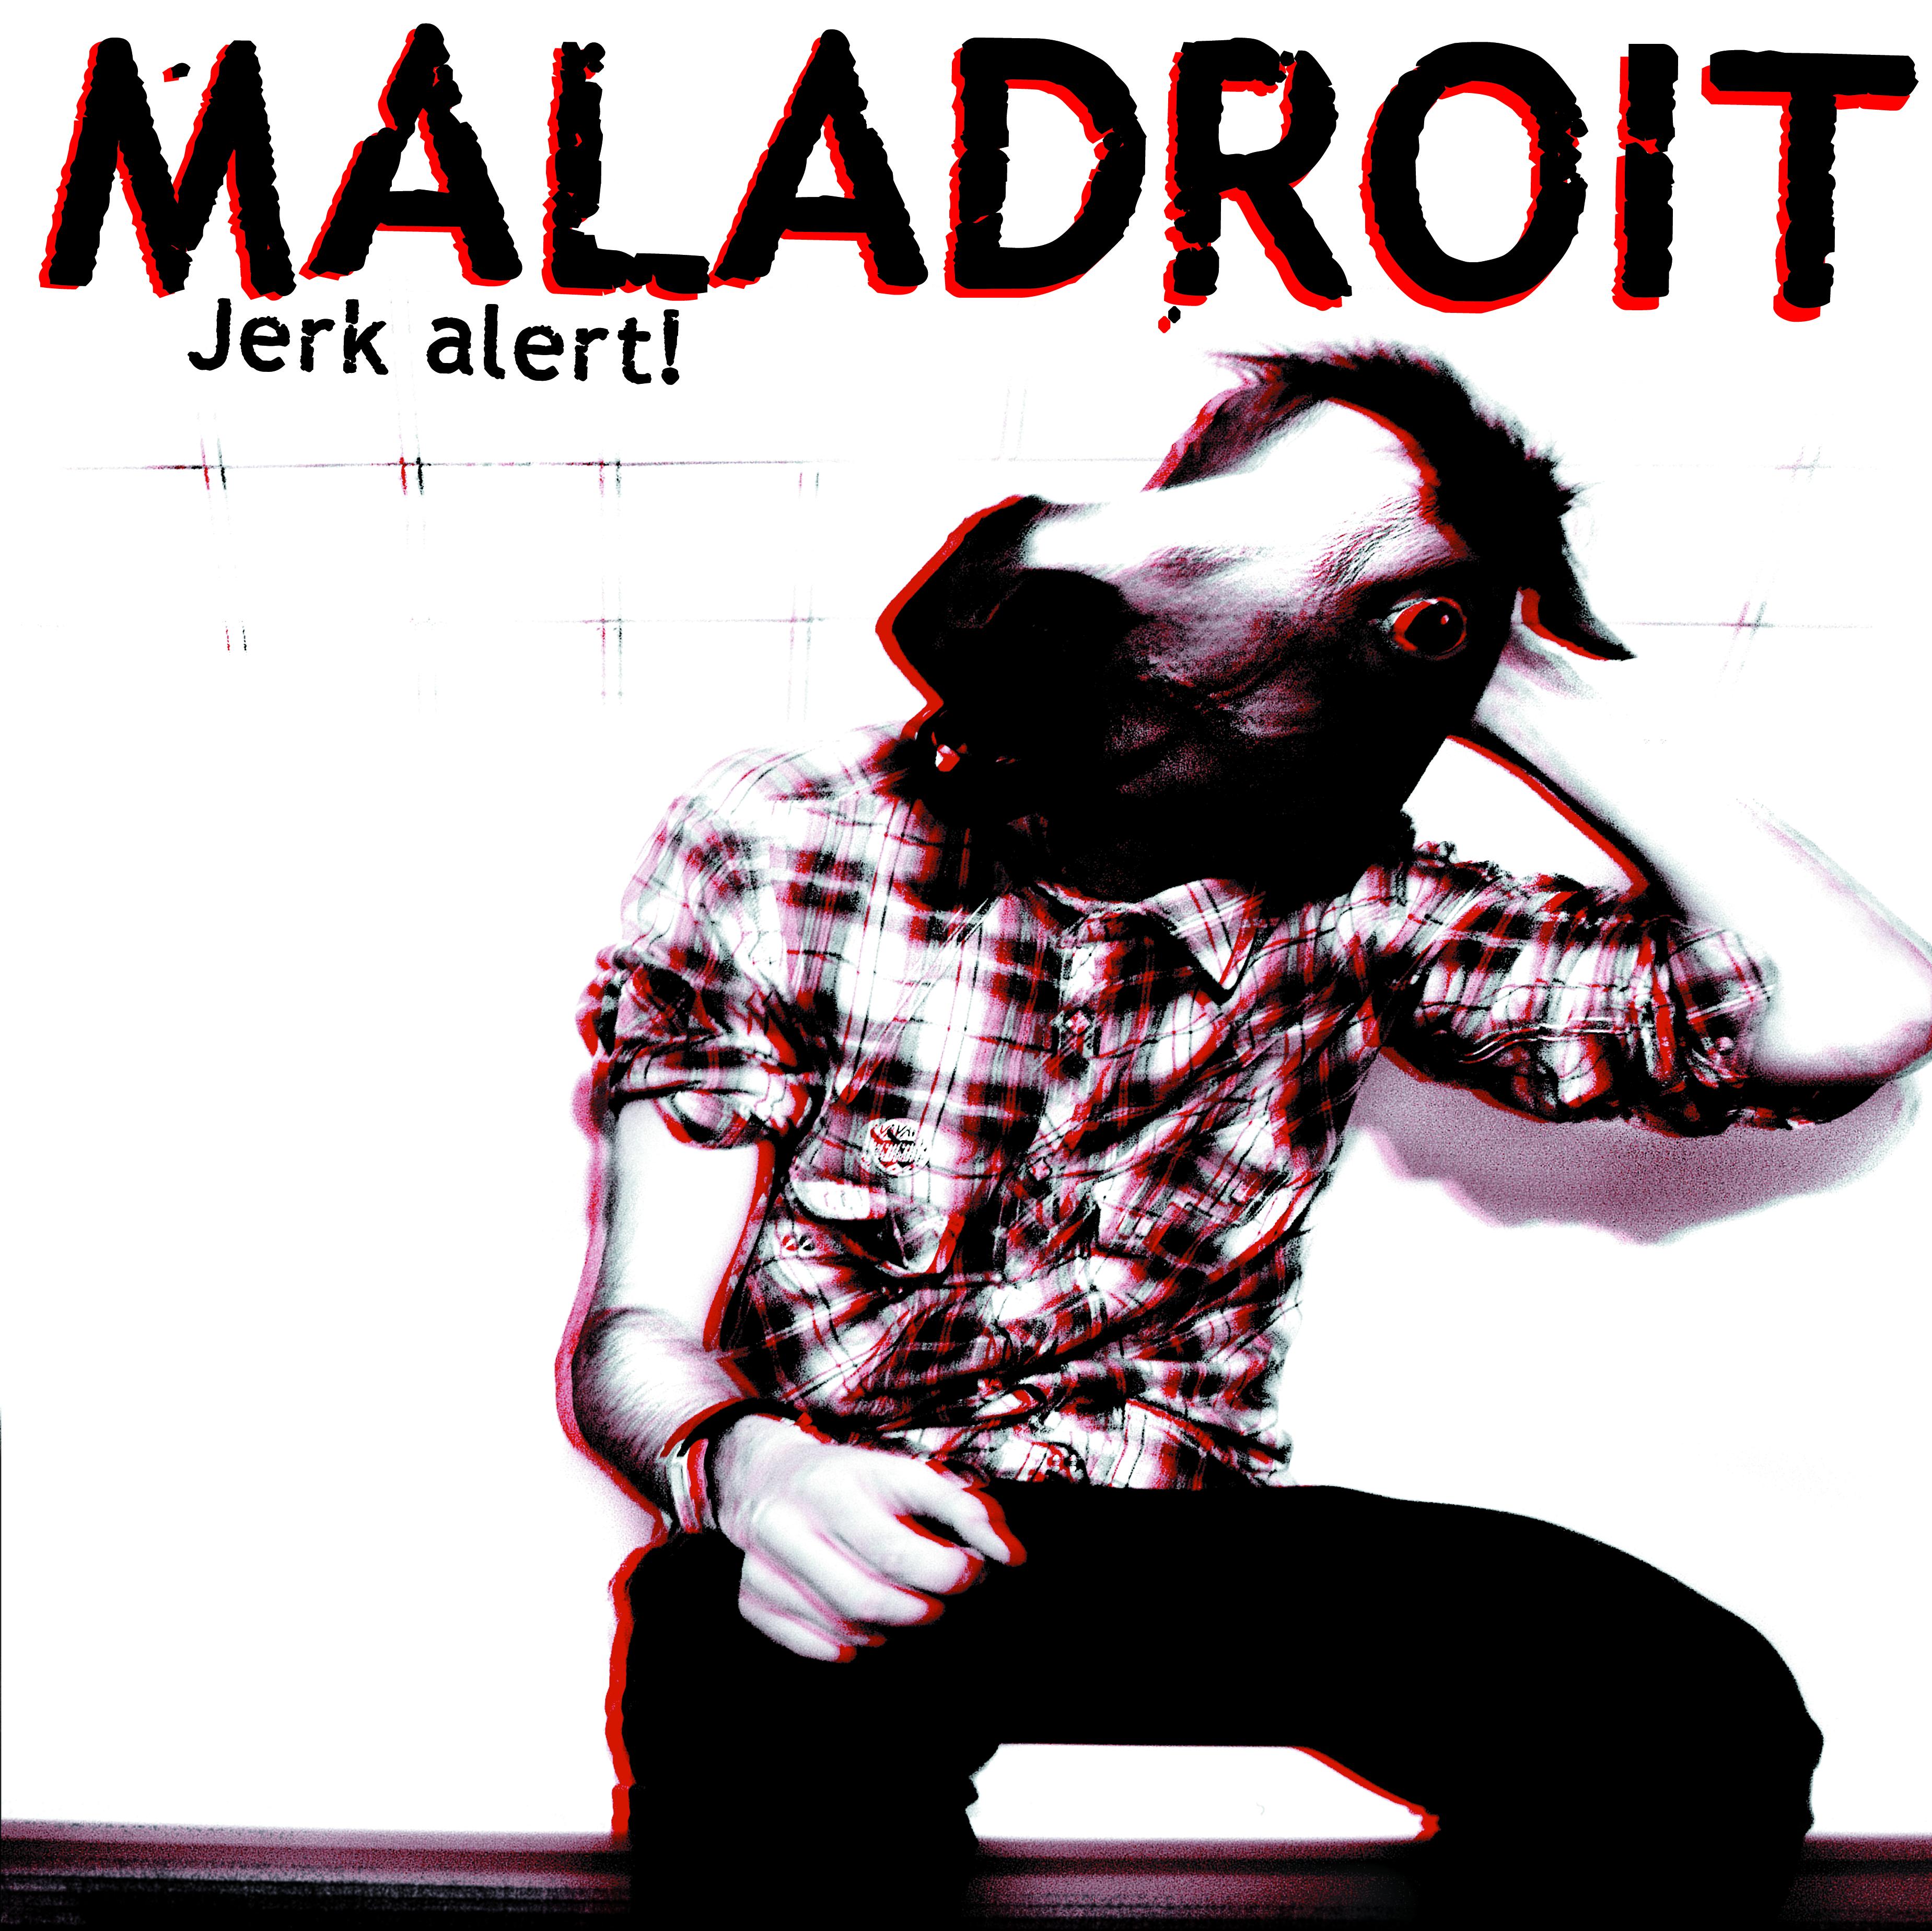 Maladroit - jerk alert !